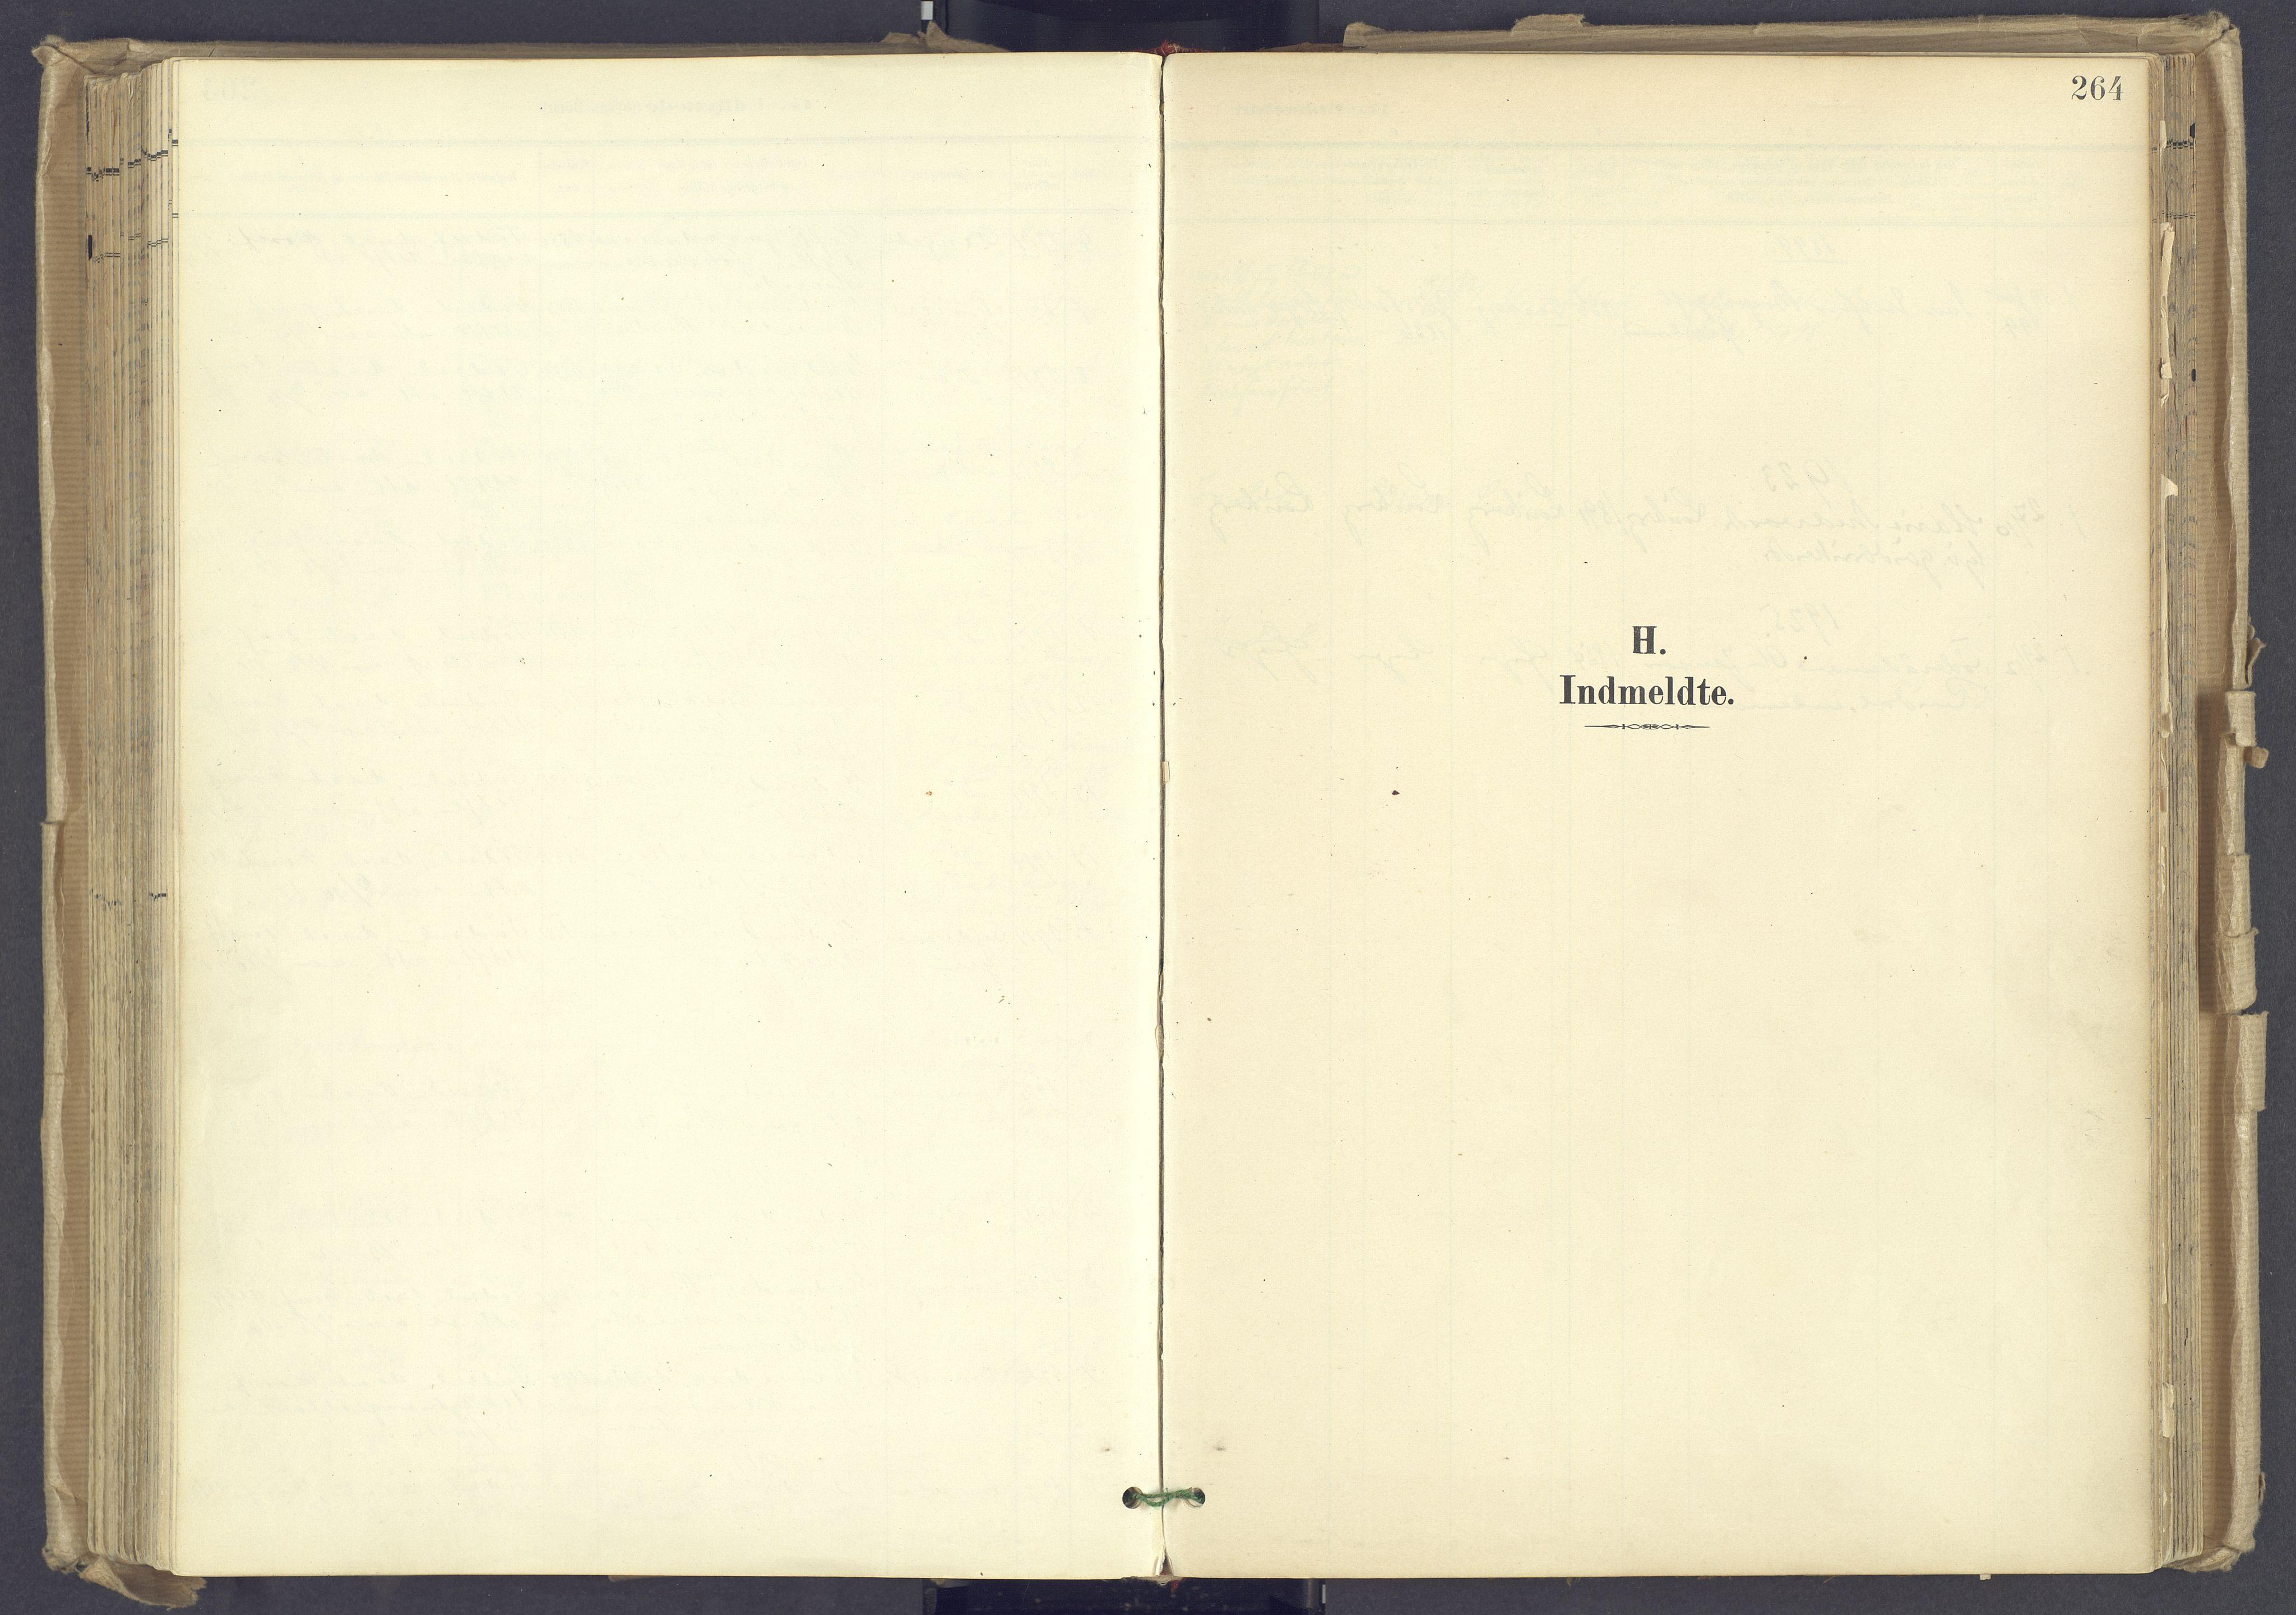 SAH, Øyer prestekontor, Ministerialbok nr. 12, 1897-1920, s. 264